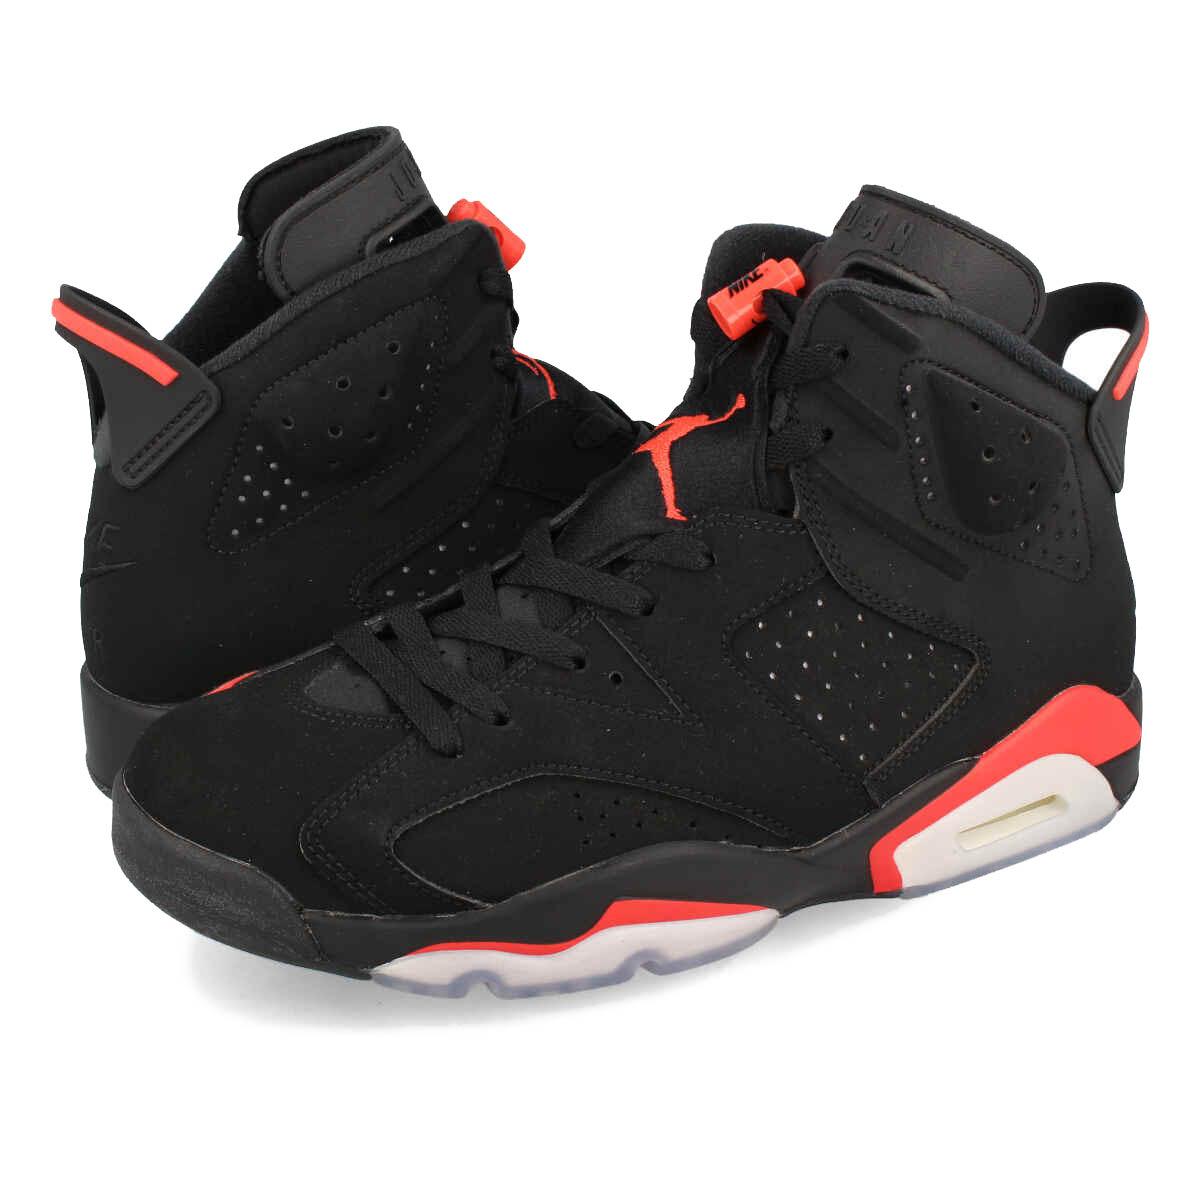 hot sales 658c1 46ebd NIKE AIR JORDAN 6 RETRO GS Nike Air Jordan 6 nostalgic GS BLACK INFRARED  384,665-060